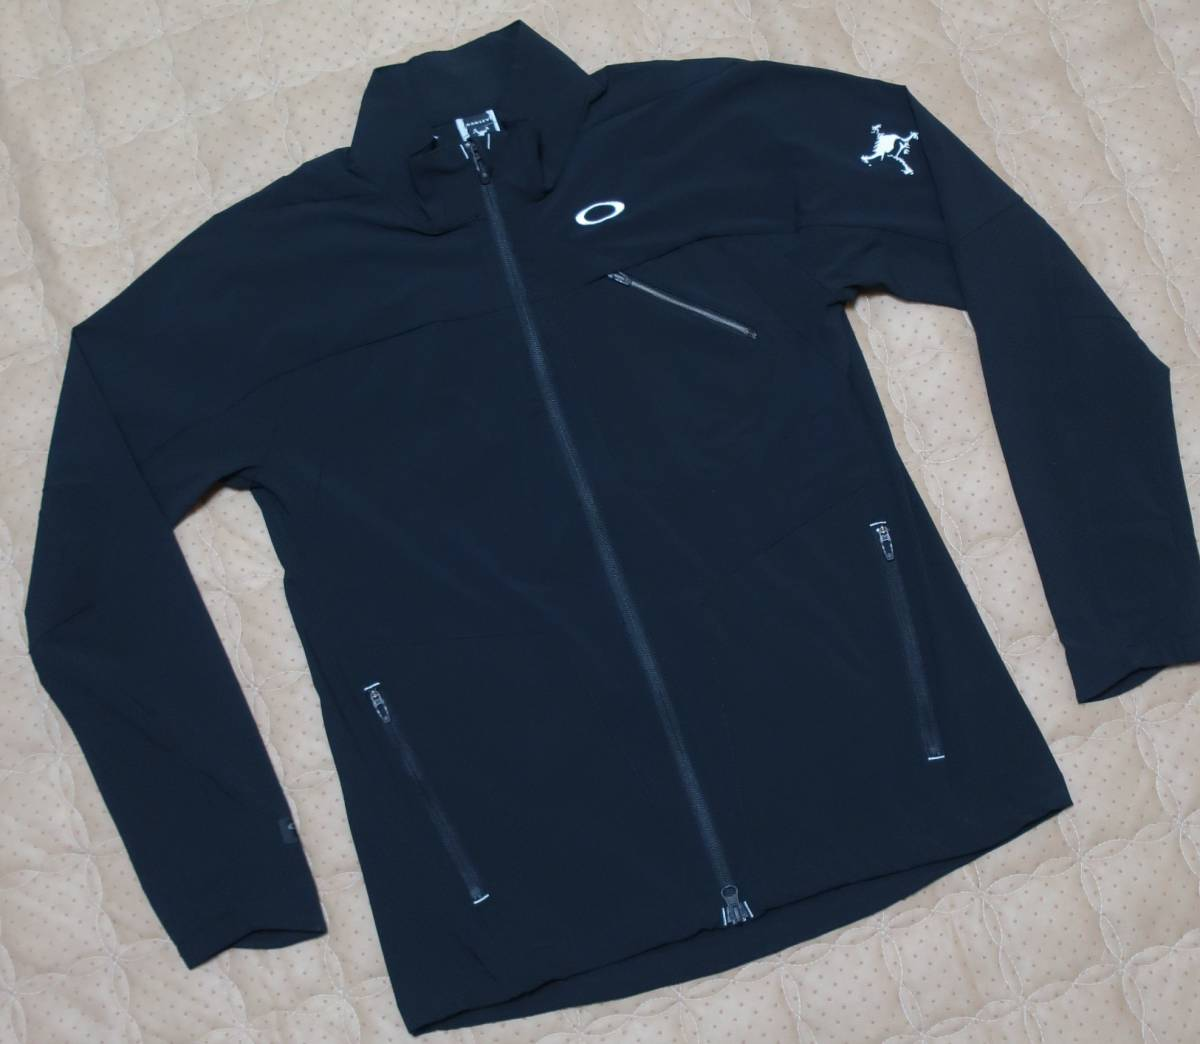 M/ (オークリー )OAKLEY GOLF ゴルフ SKULL BREATHEABLE JACKET 4WAYストレッチ BREATHEABLE ジャケット/412549JP-02E